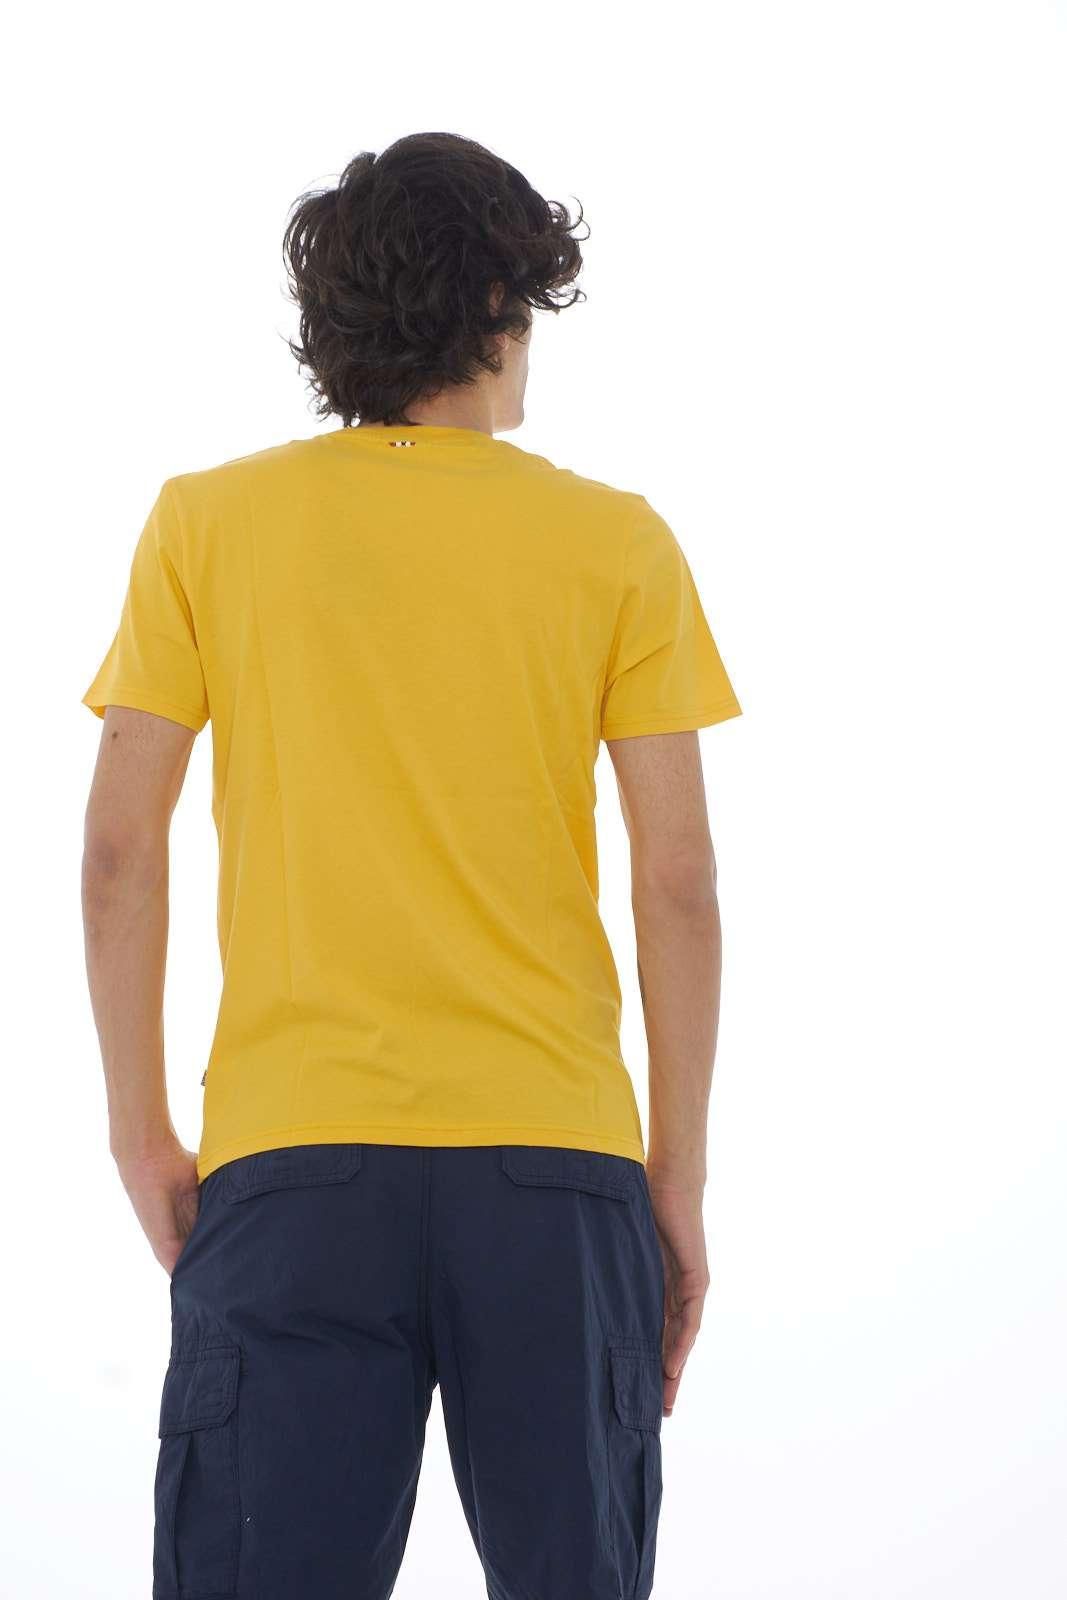 https://www.parmax.com/media/catalog/product/a/i/PE-outlet_parmax-t-shirt-uomo-Napapijri-N0YJAY-C.jpg